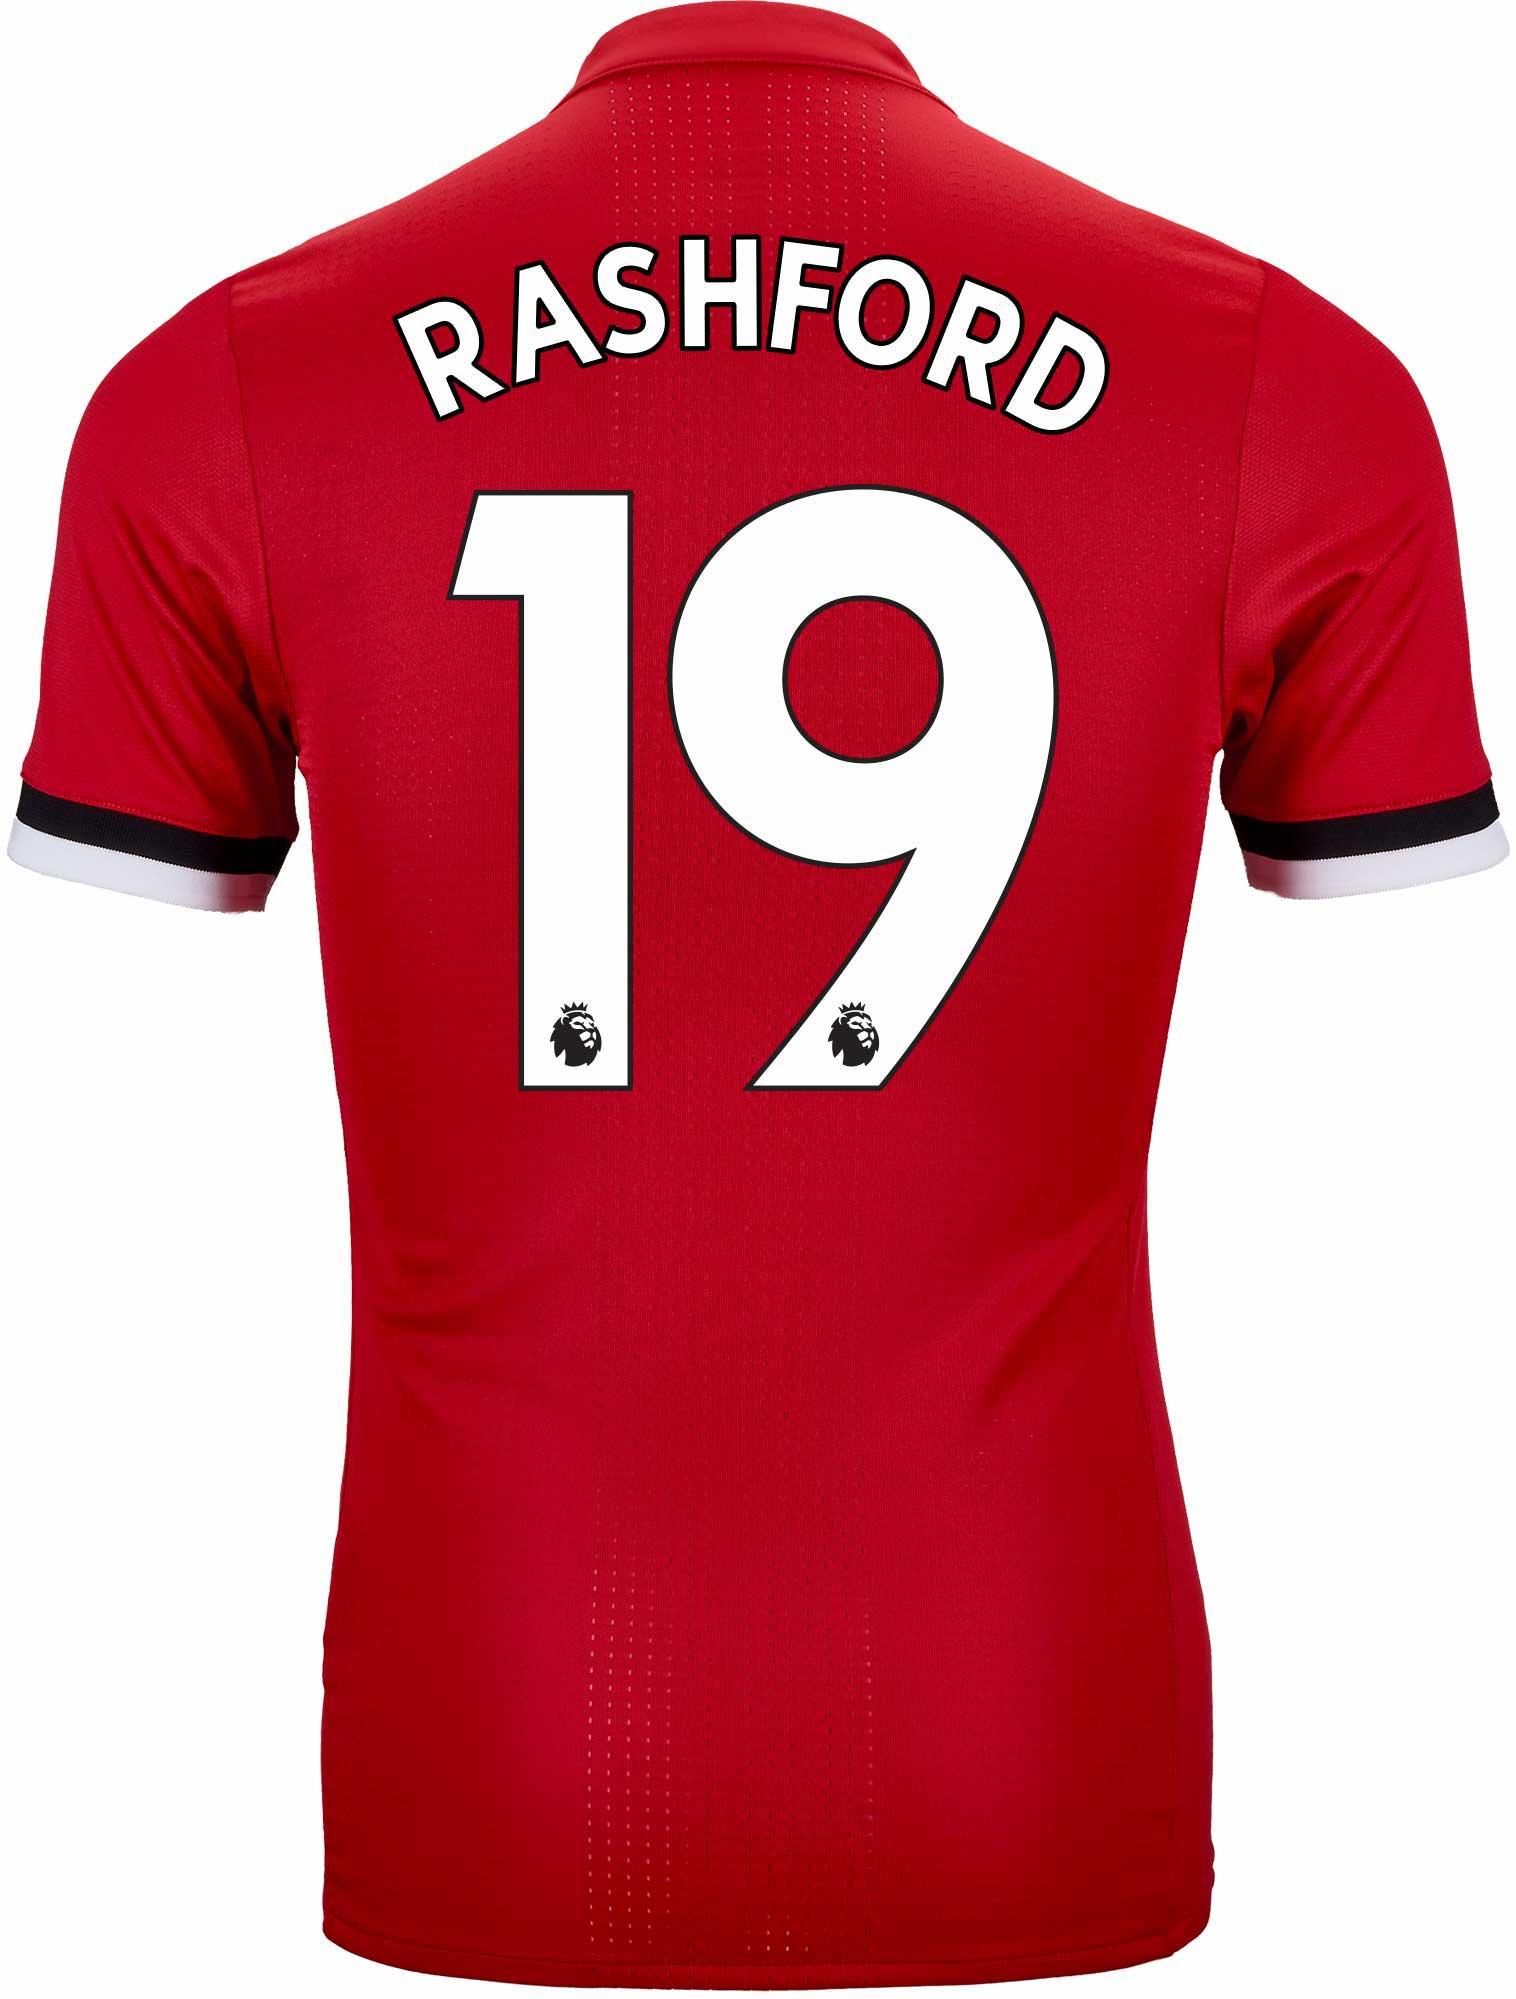 b167ecb5b23 adidas Marcus Rashford Manchester United Authentic Home Jersey 2017-18